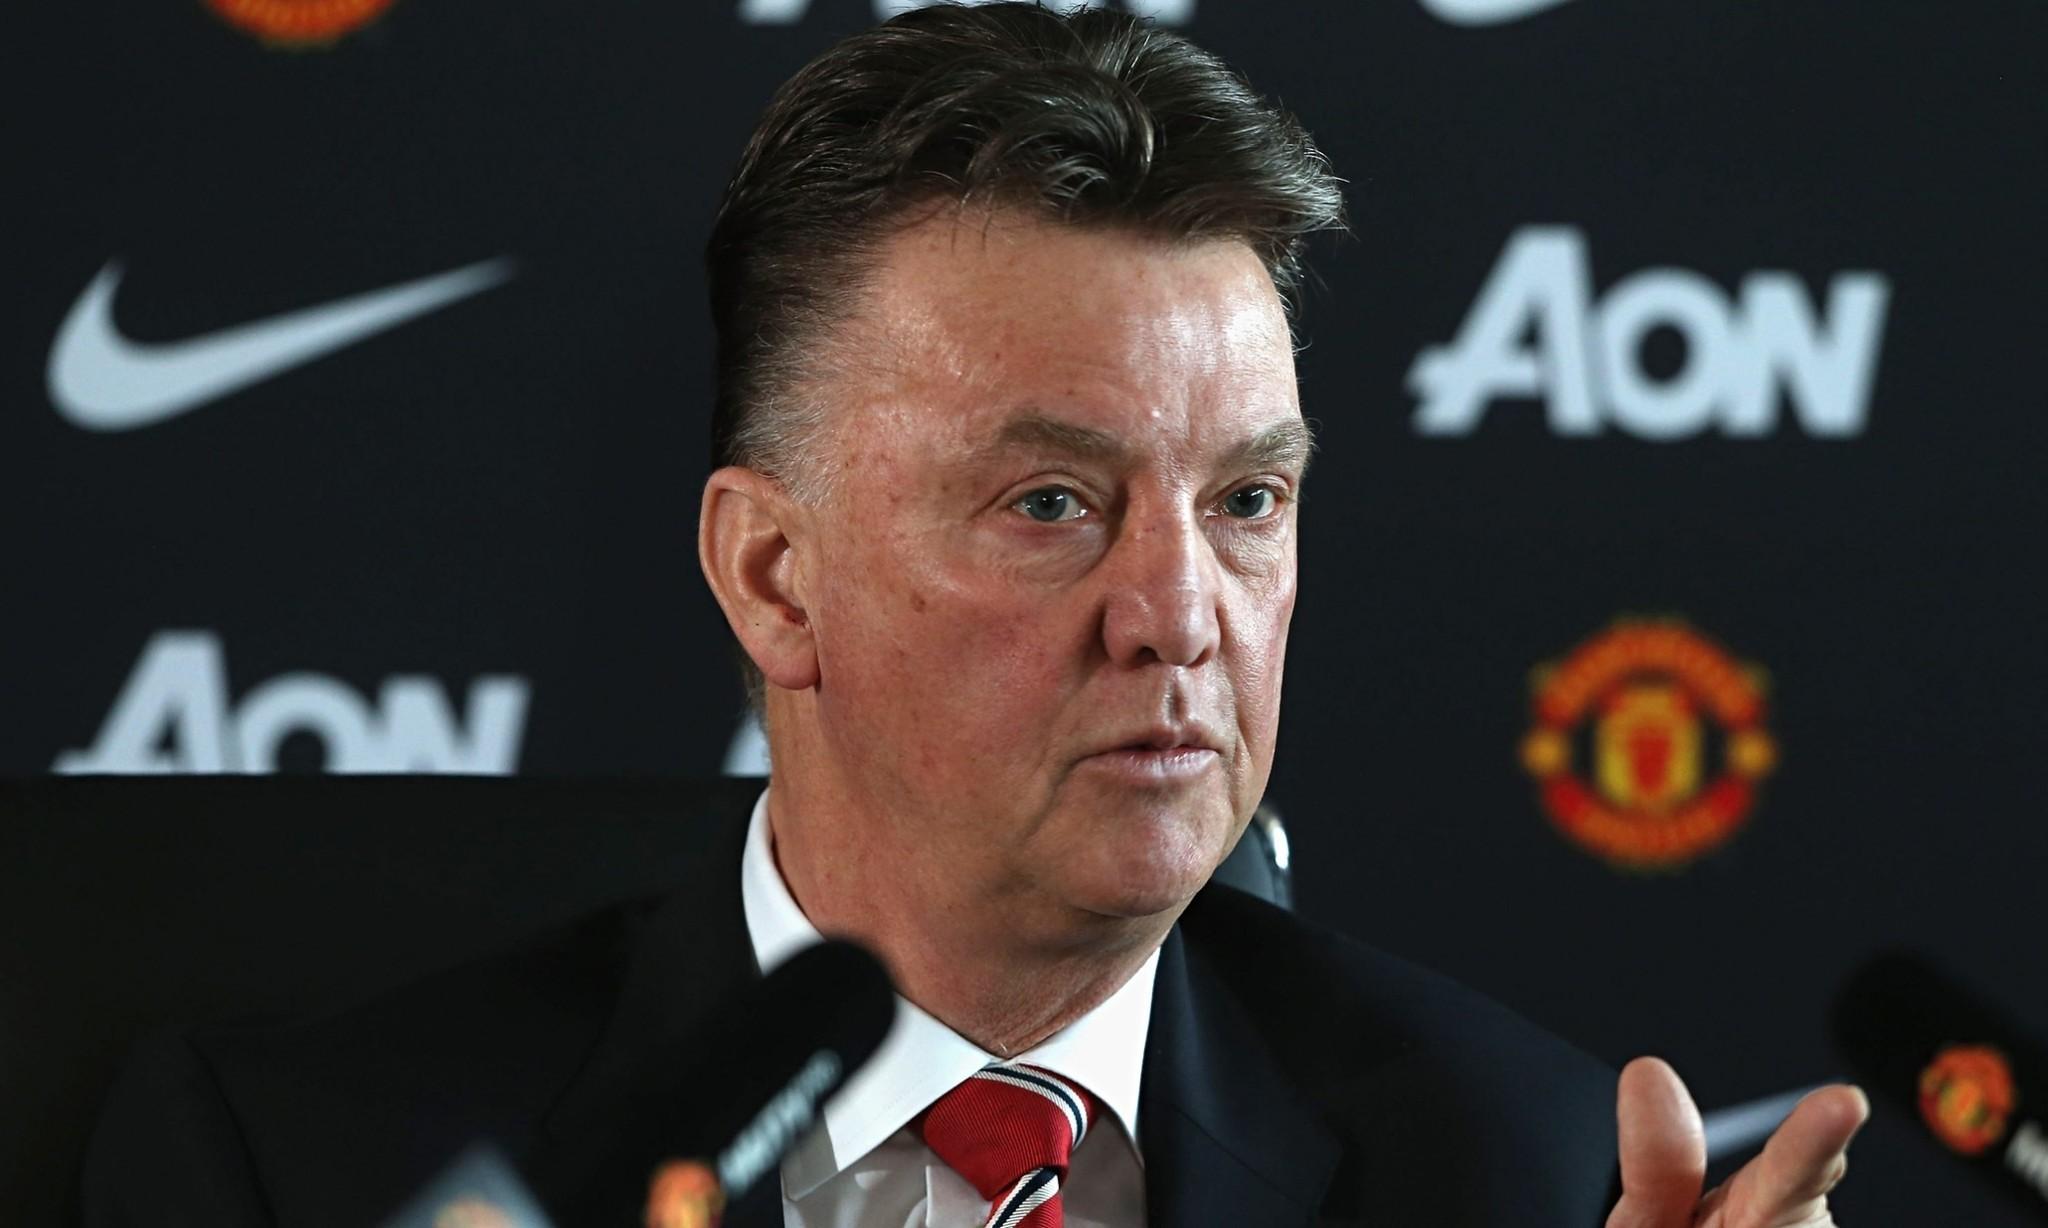 Louis van Gaal: Manchester United do not have a 20-goal striker